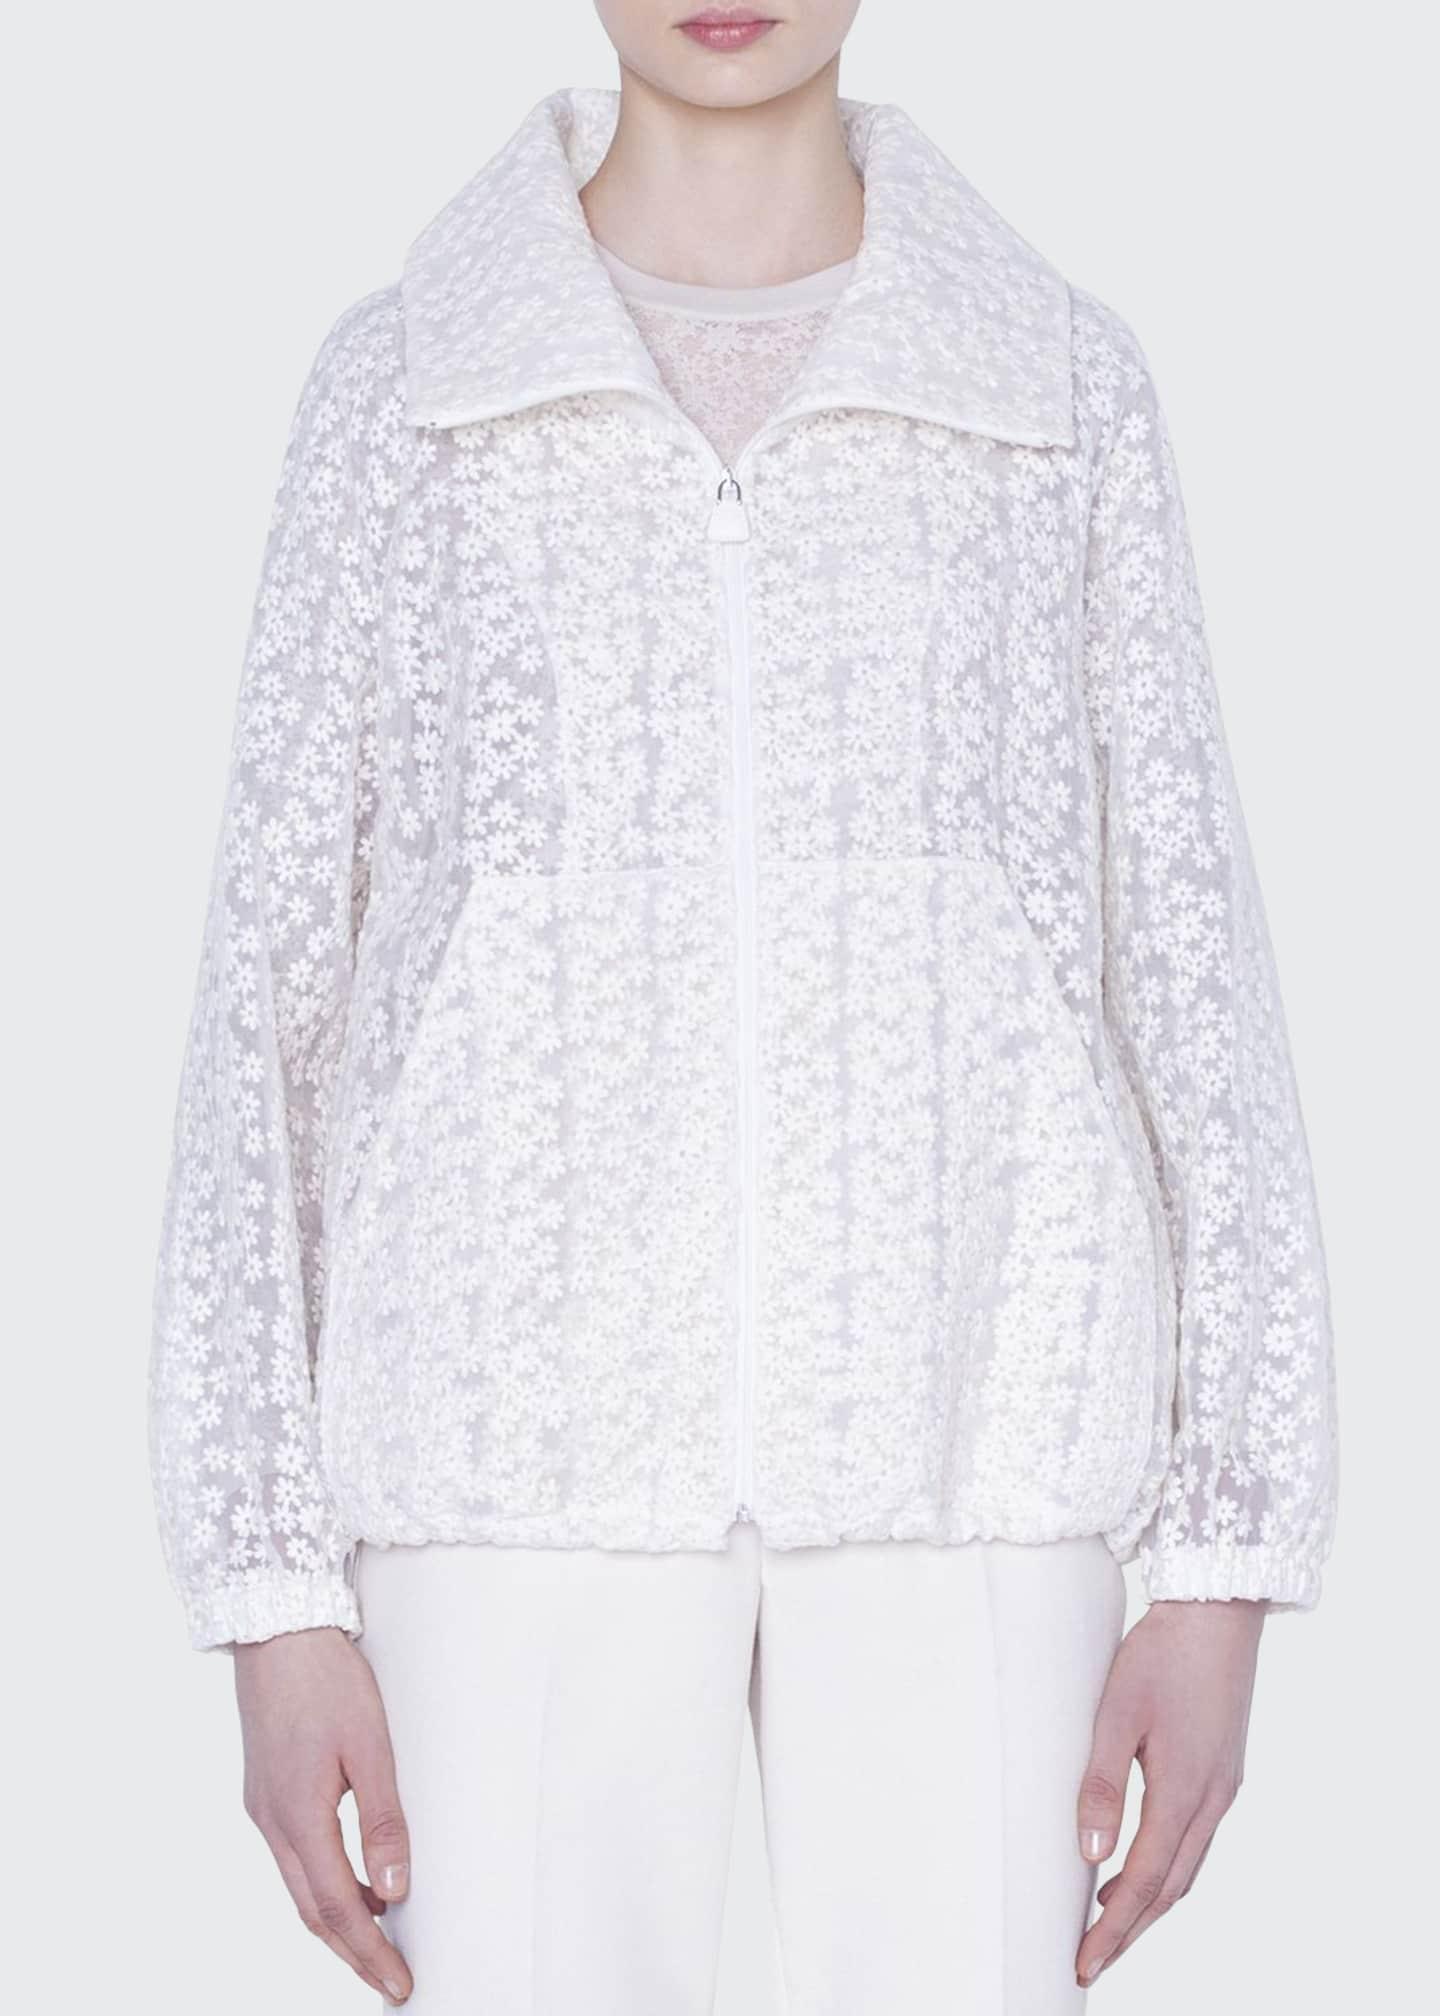 Akris Clelia Daisy Embroidered Organza Jacket